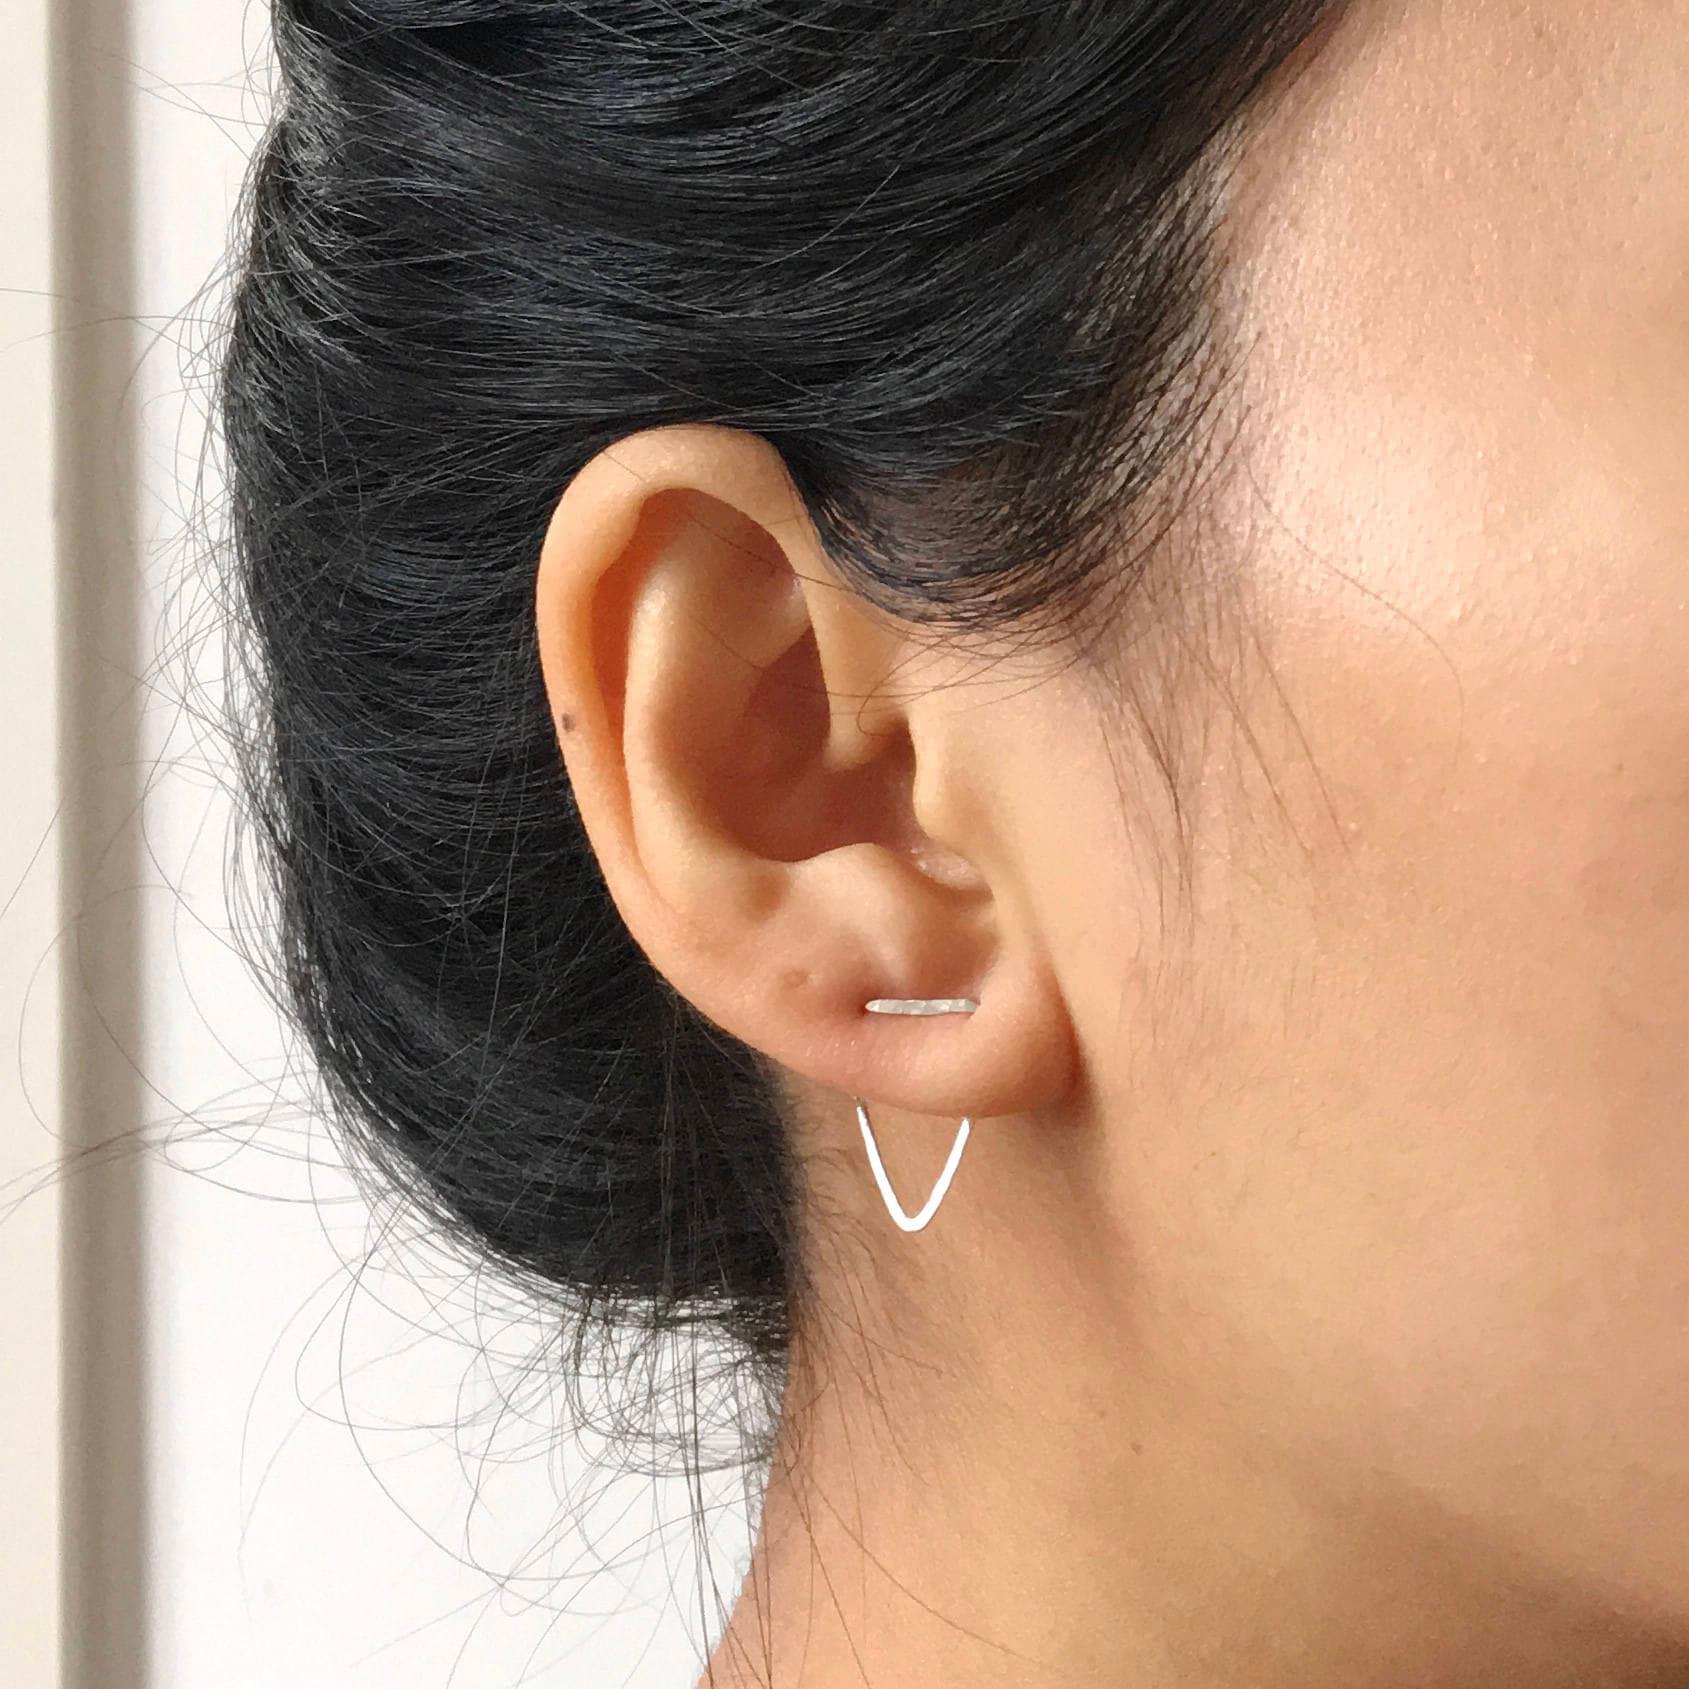 Doppelt Piercing zwei-Loch-Ohrring Dreieck Ohrringe   Etsy